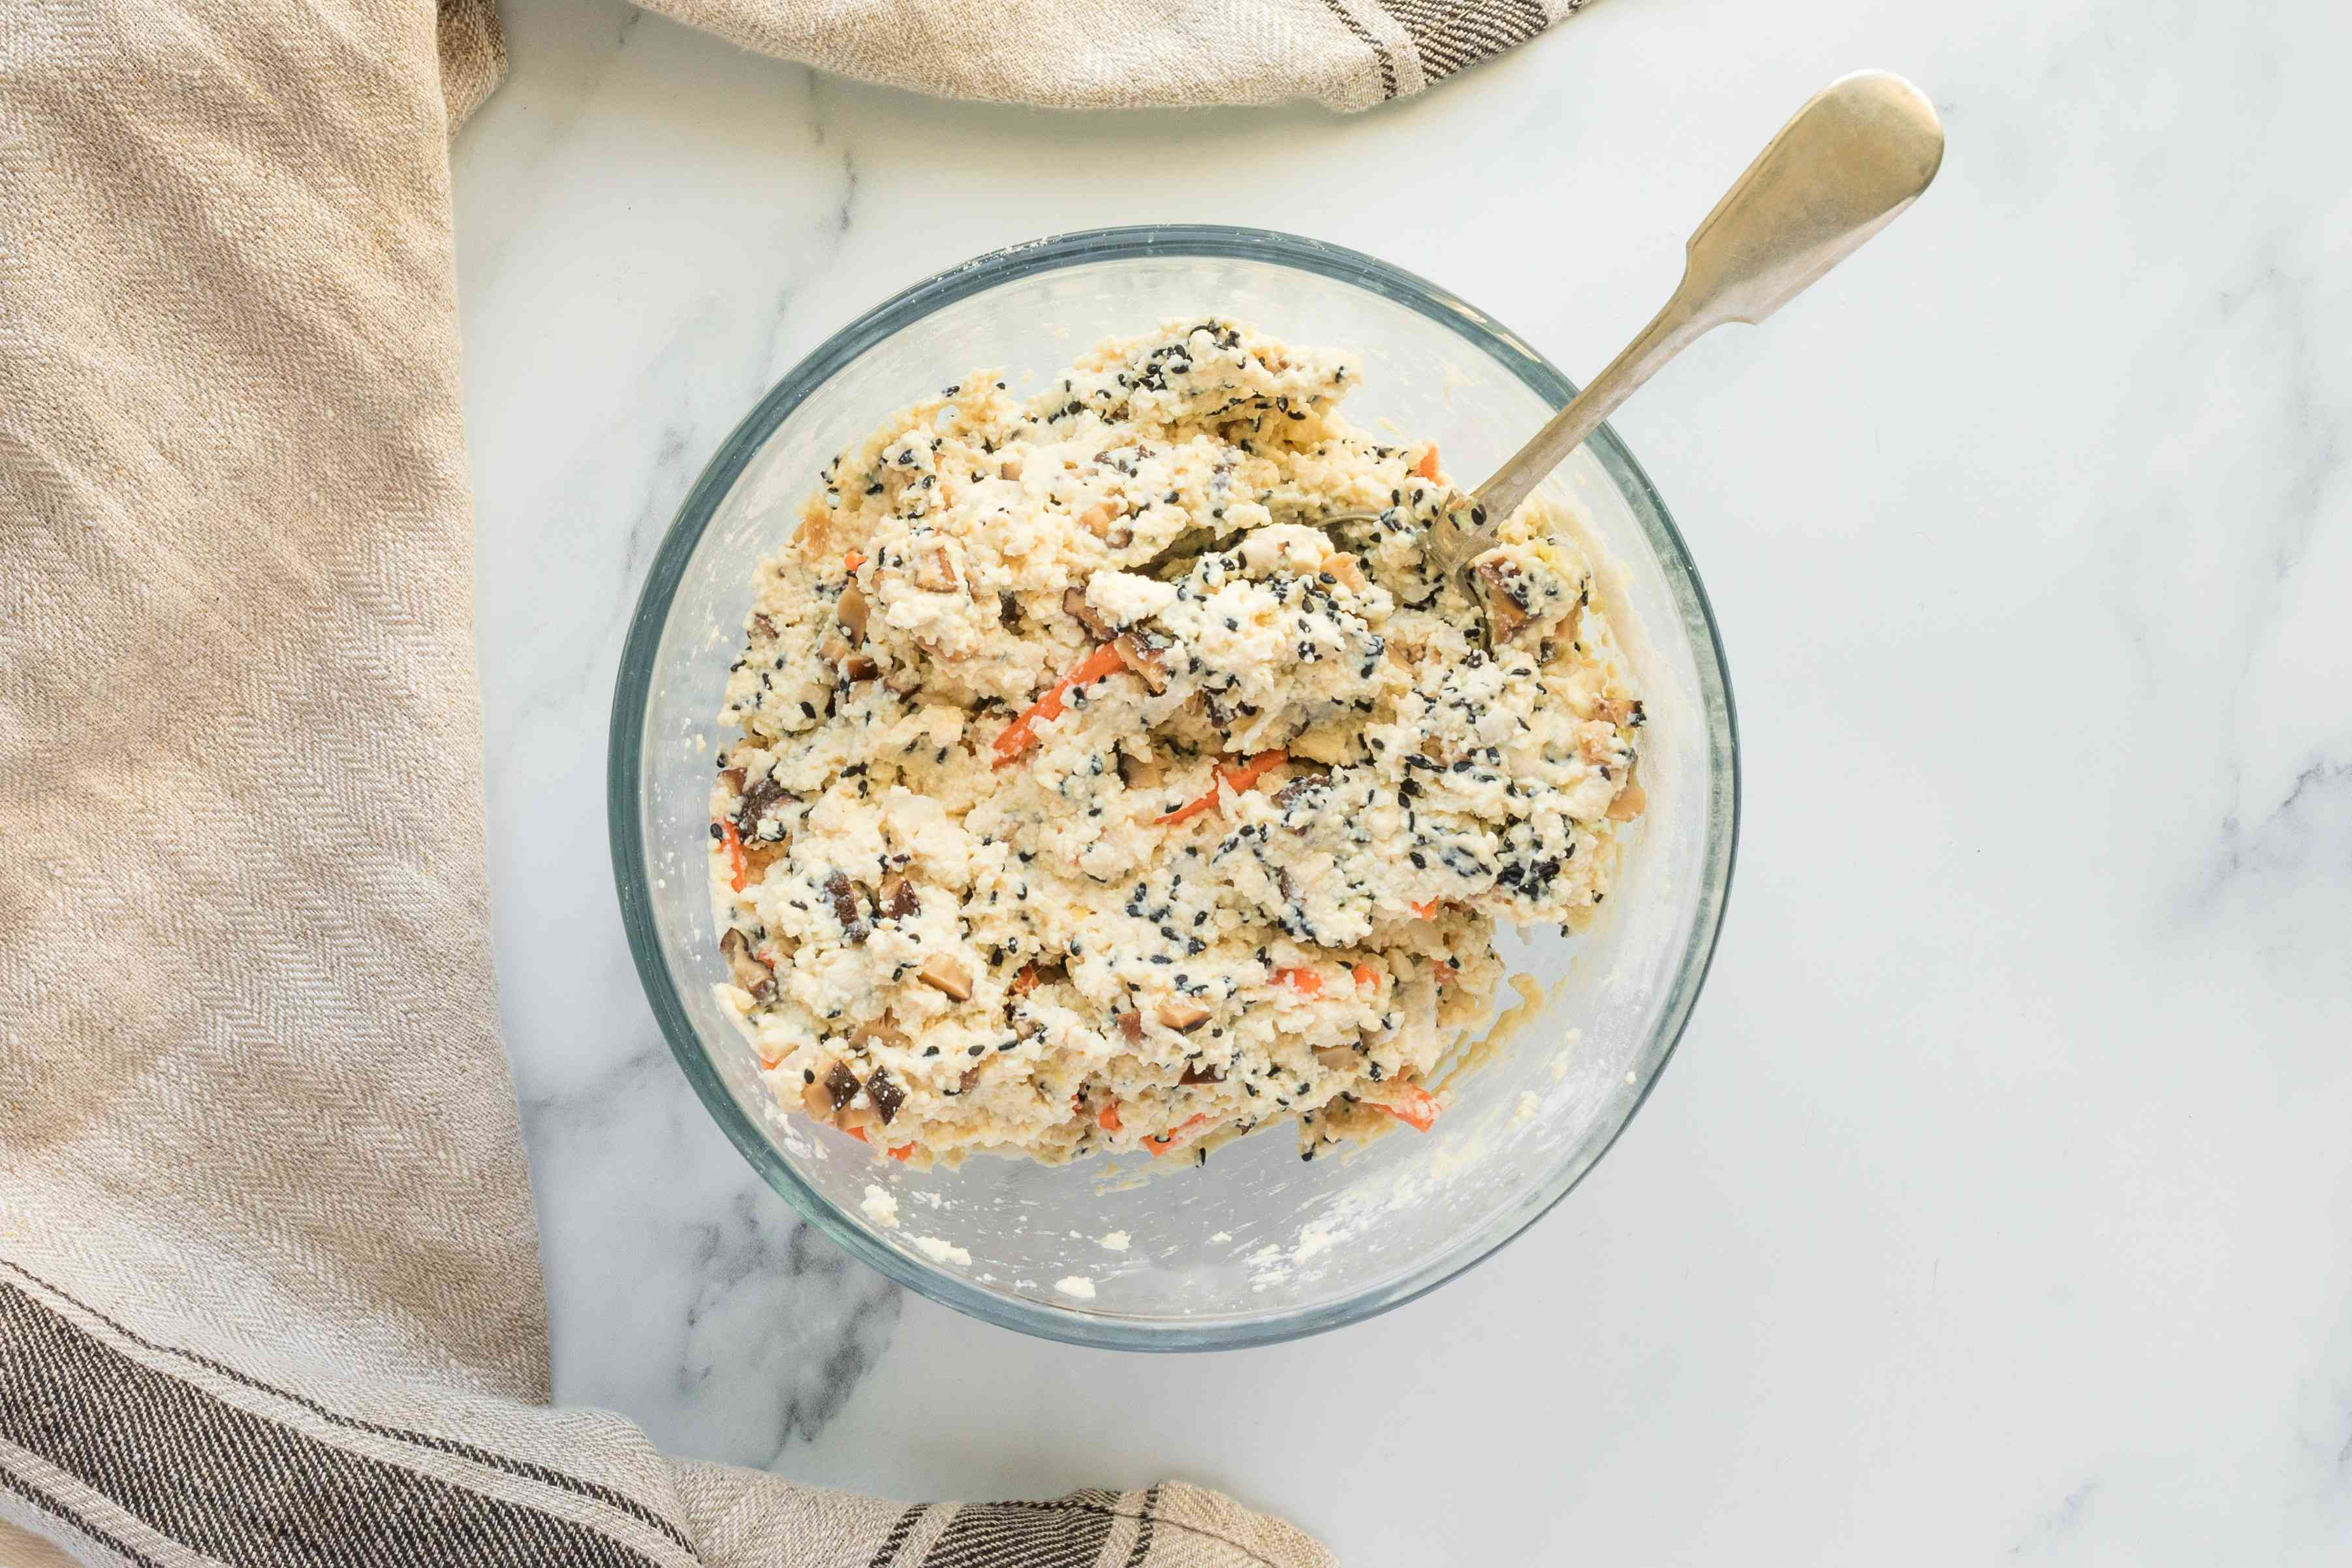 Add carrot and shiitake